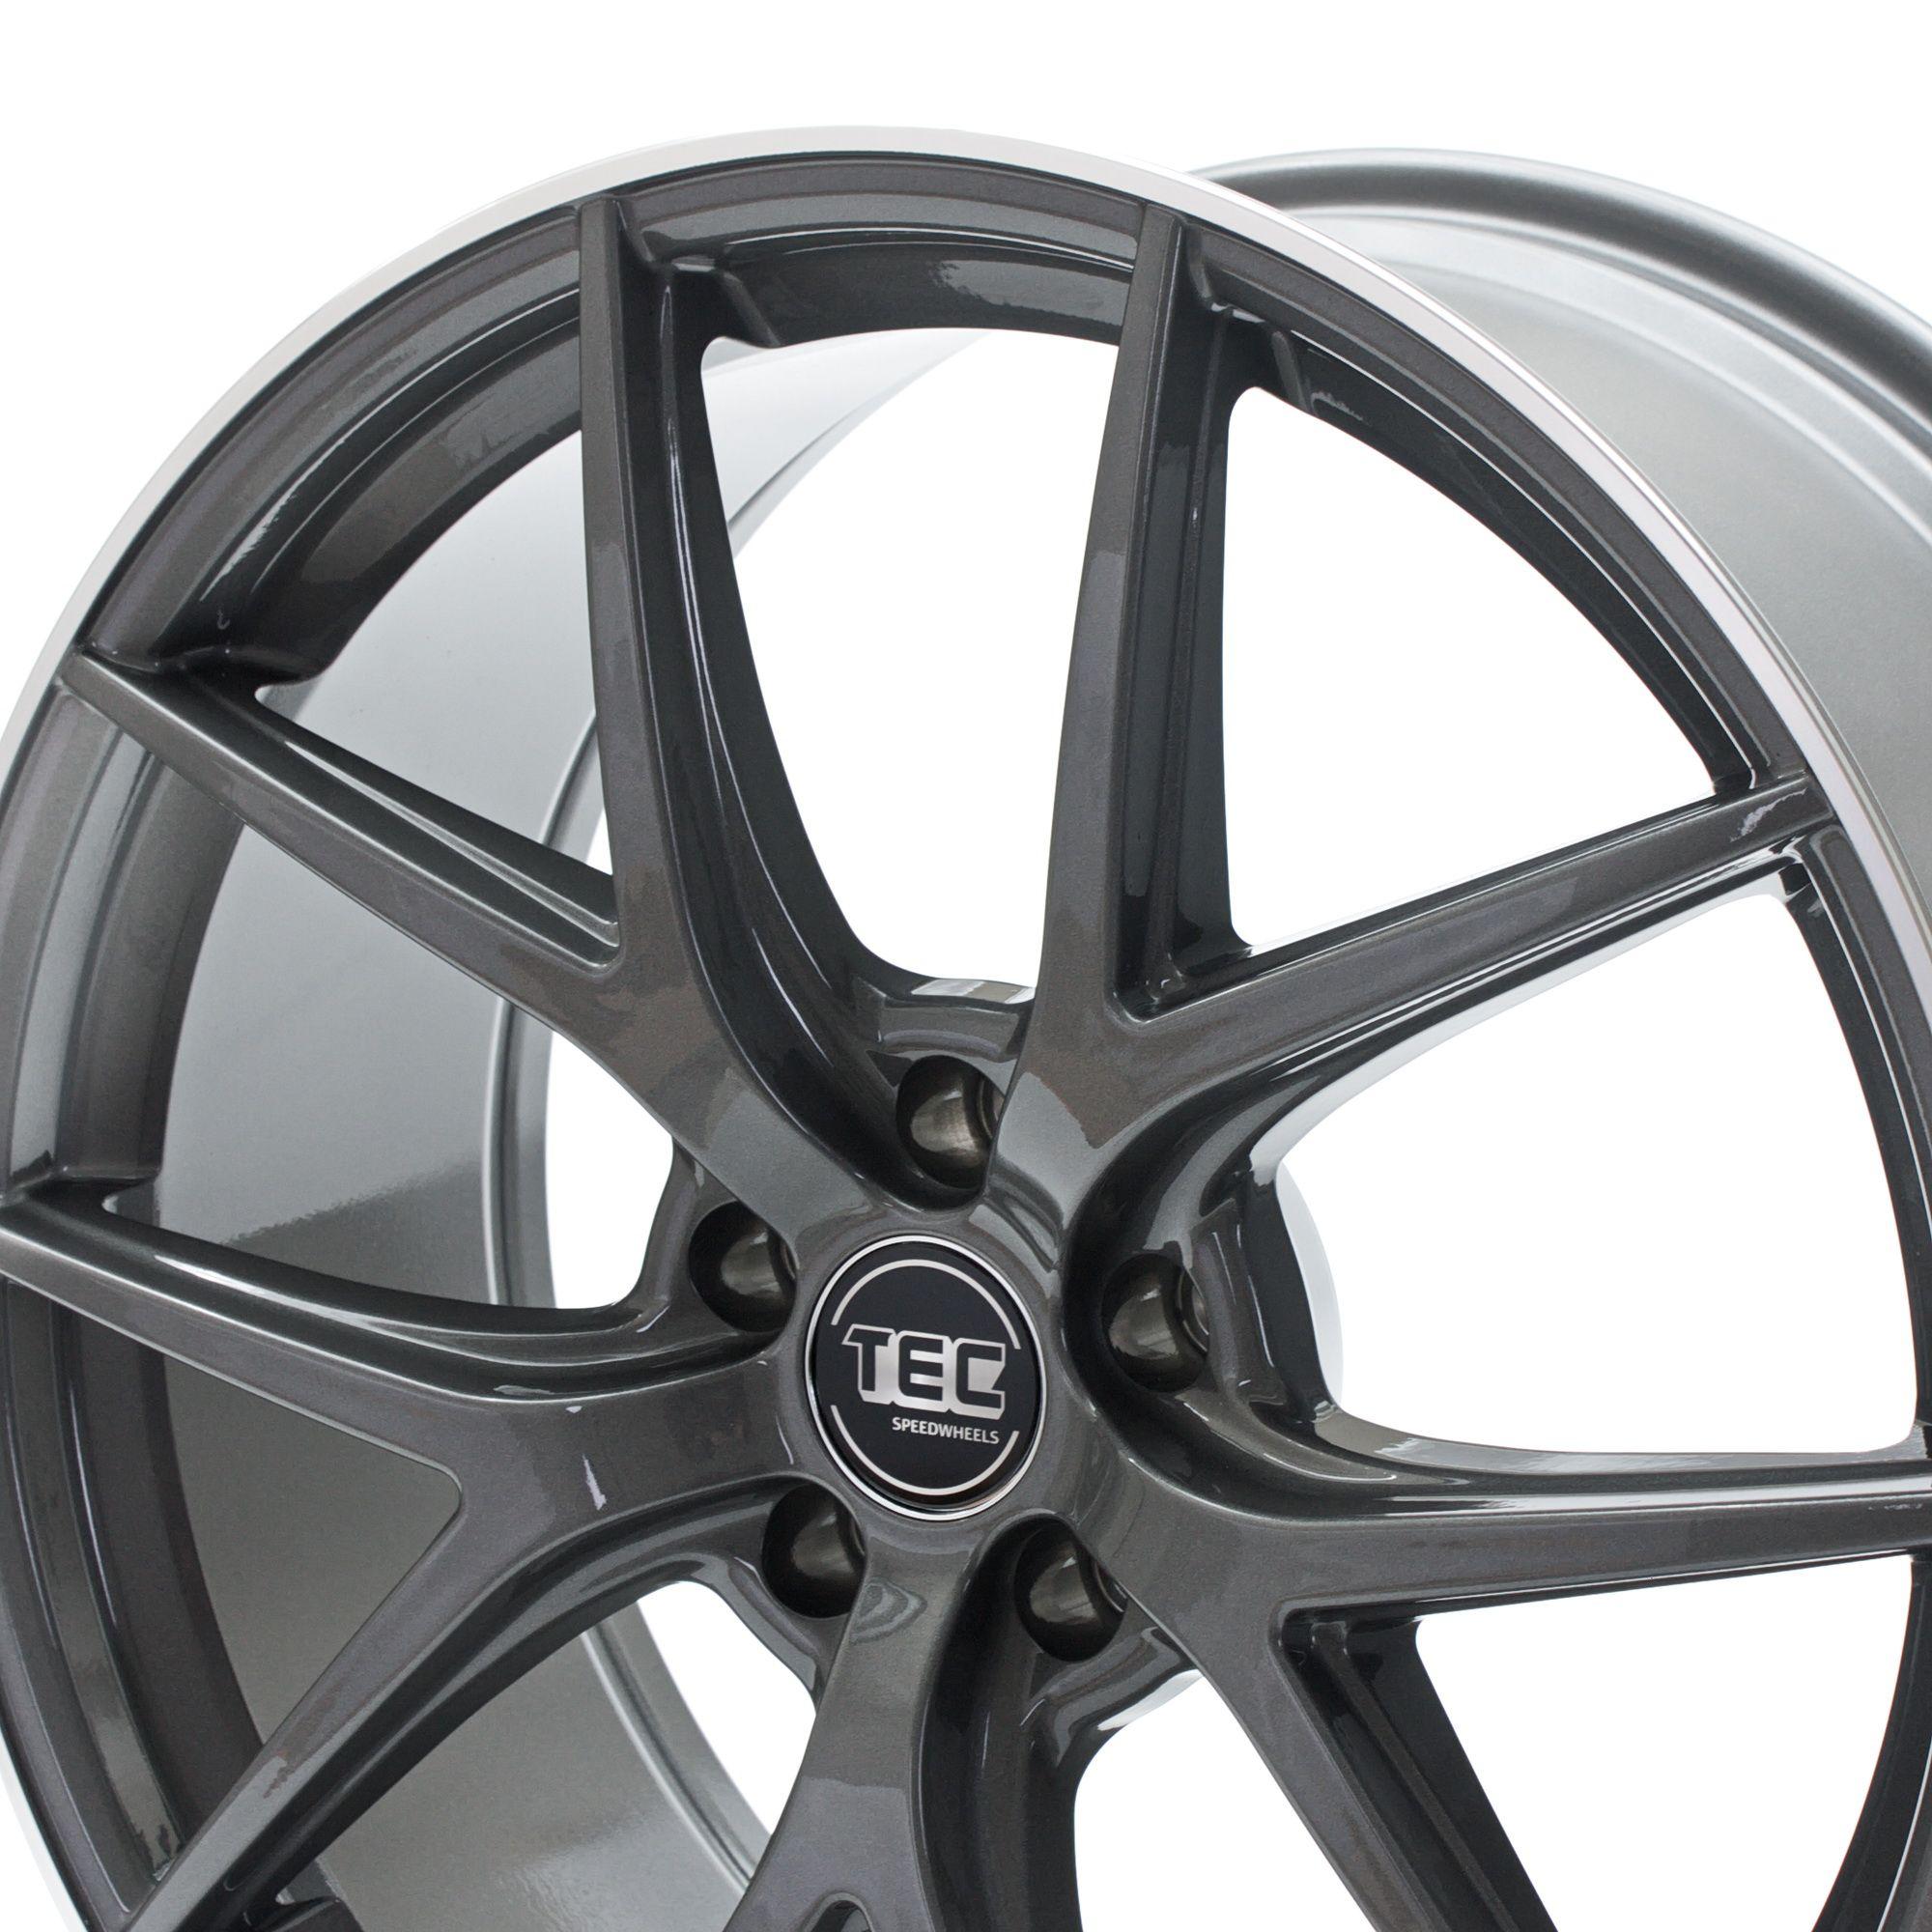 tec speedwheels gt6 felgen dark grey polished lip grau. Black Bedroom Furniture Sets. Home Design Ideas